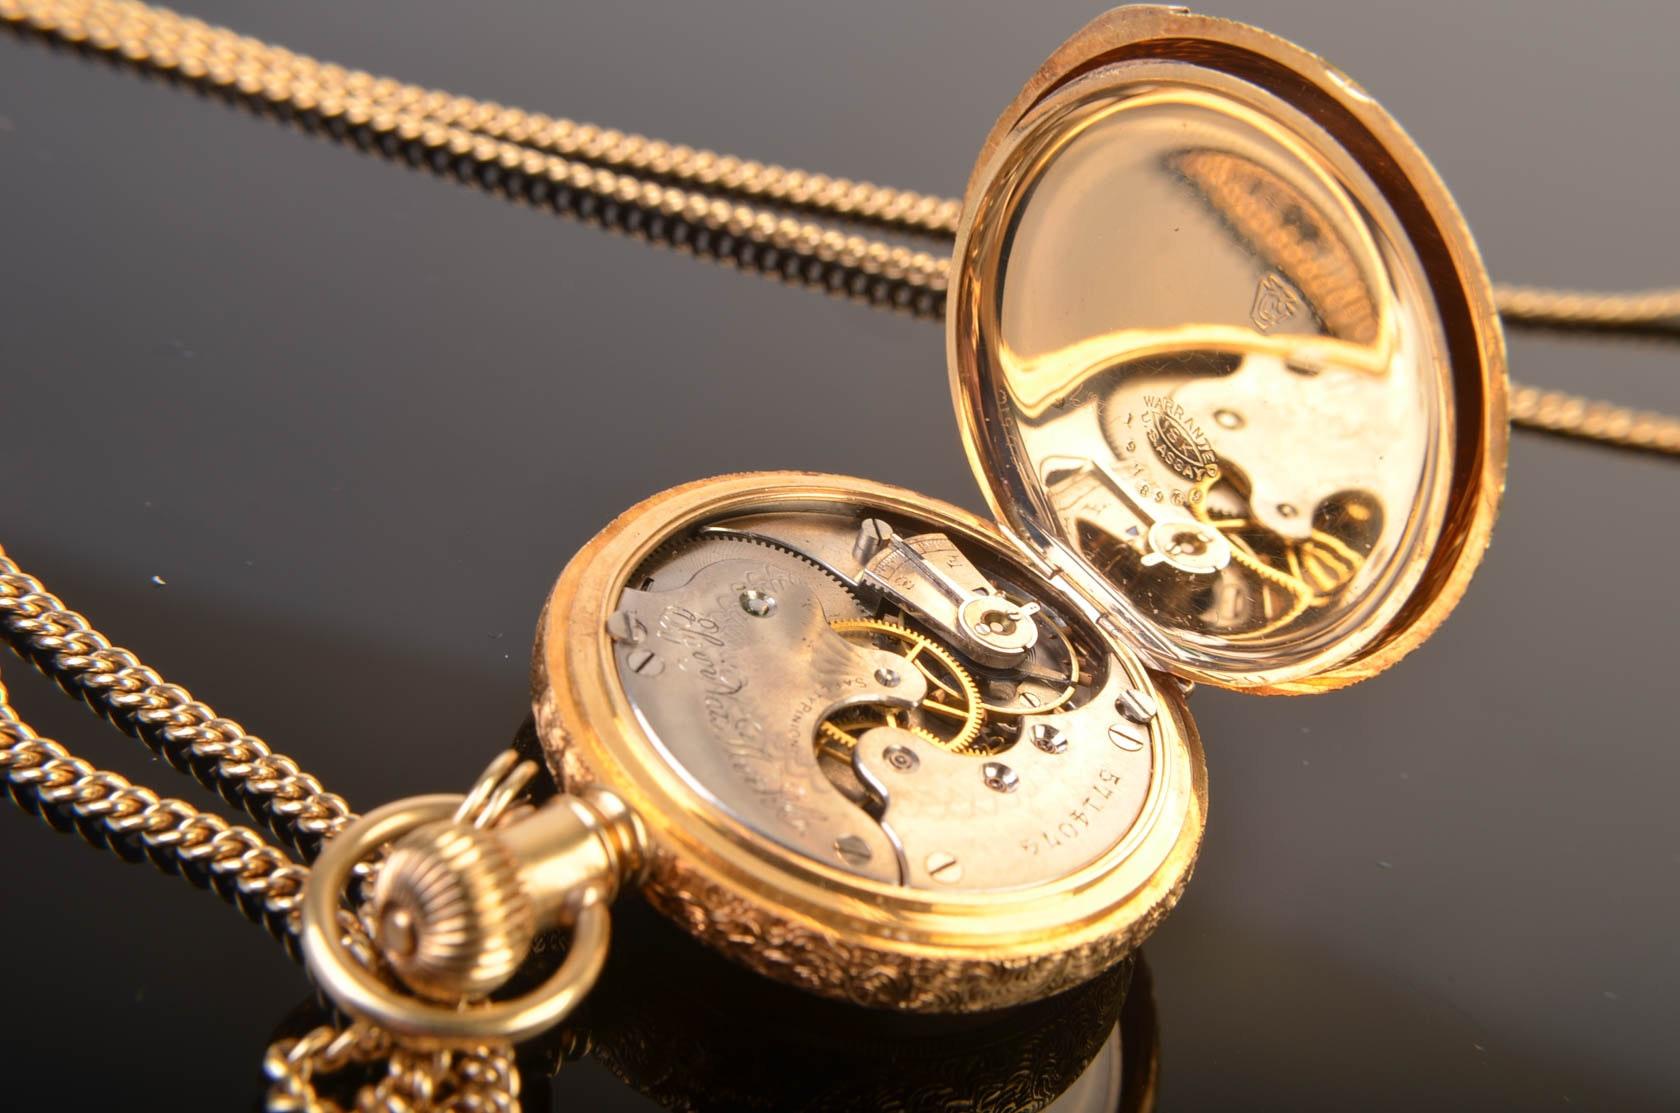 Elgin pocket watch dating by serial number